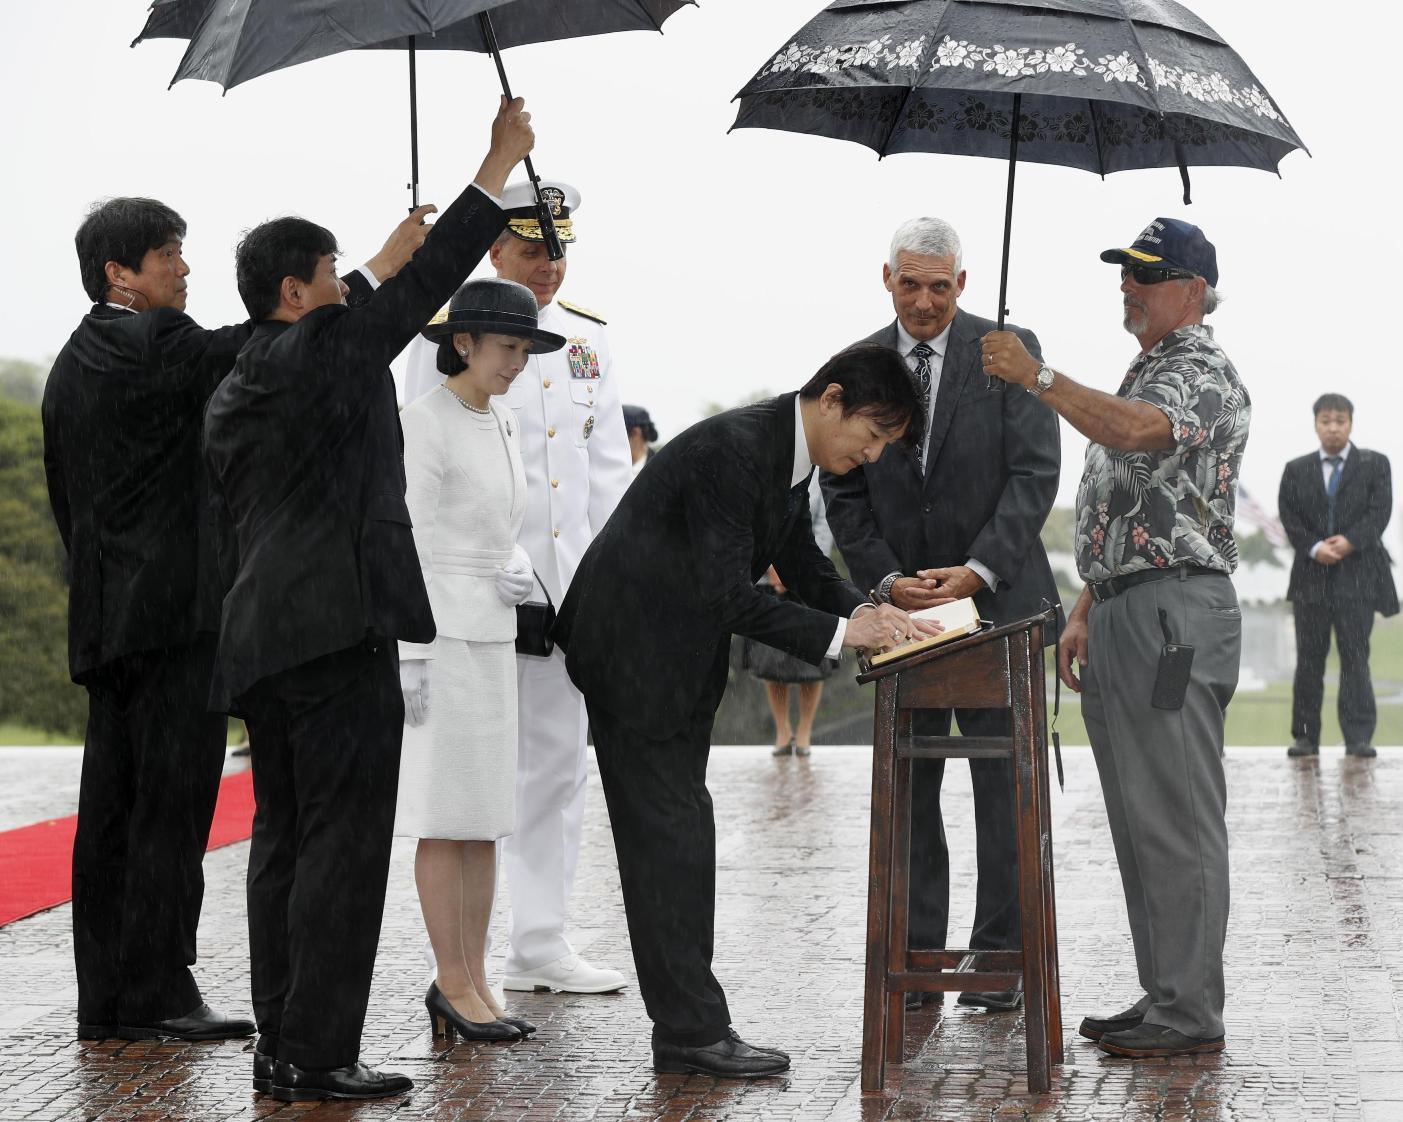 Prince and Princess Akishino's Visit Reaffirms Japan's Special Ties with Hawaii